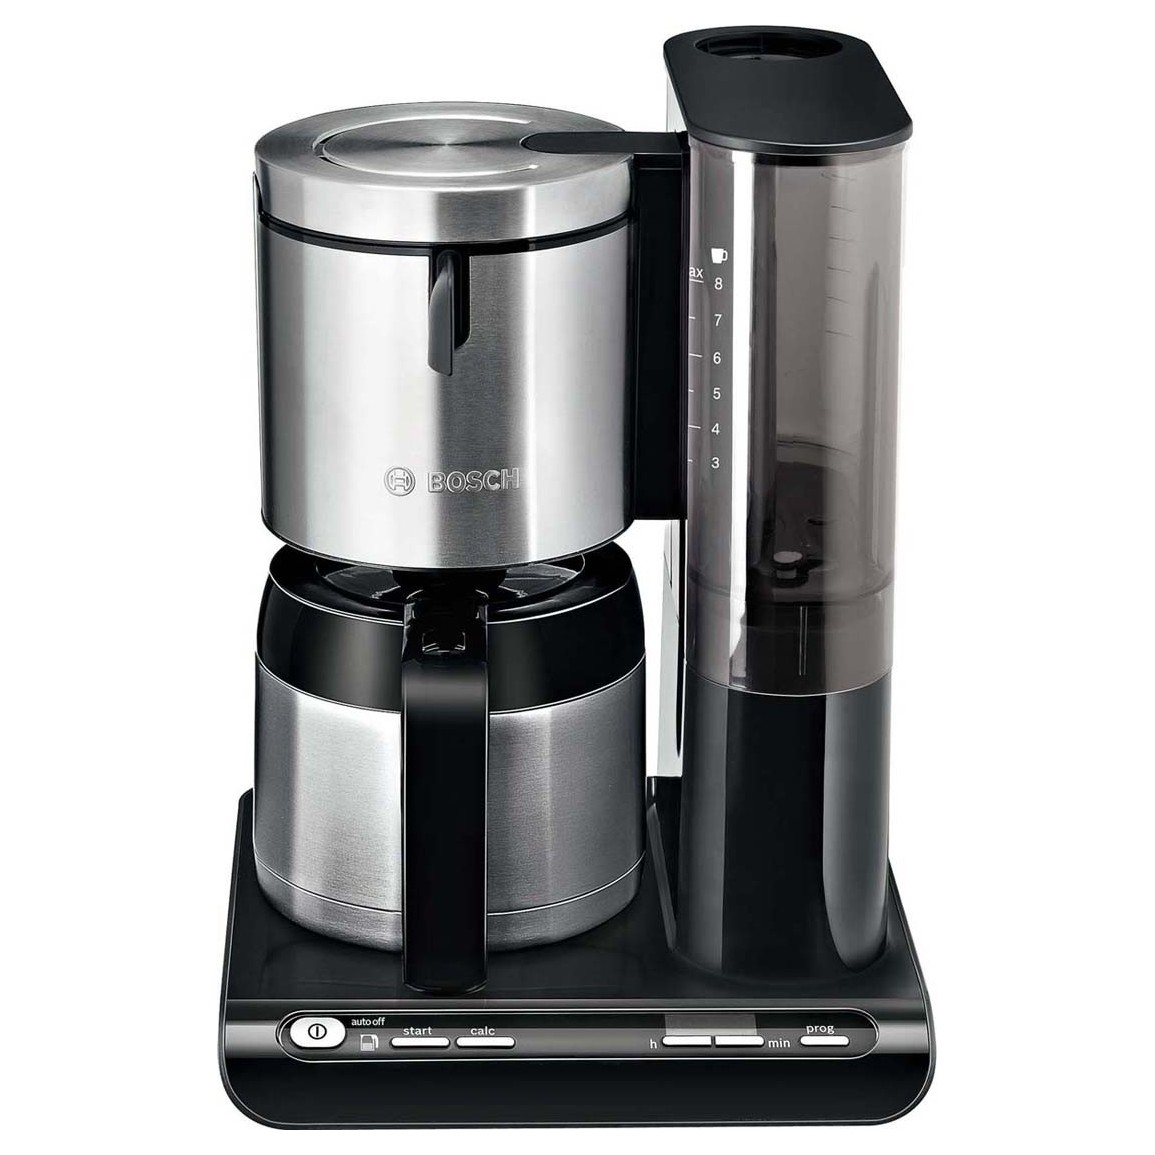 Bosch Kleingeräte+HT Thermo-Kaffee-Automat TKA8653 sw